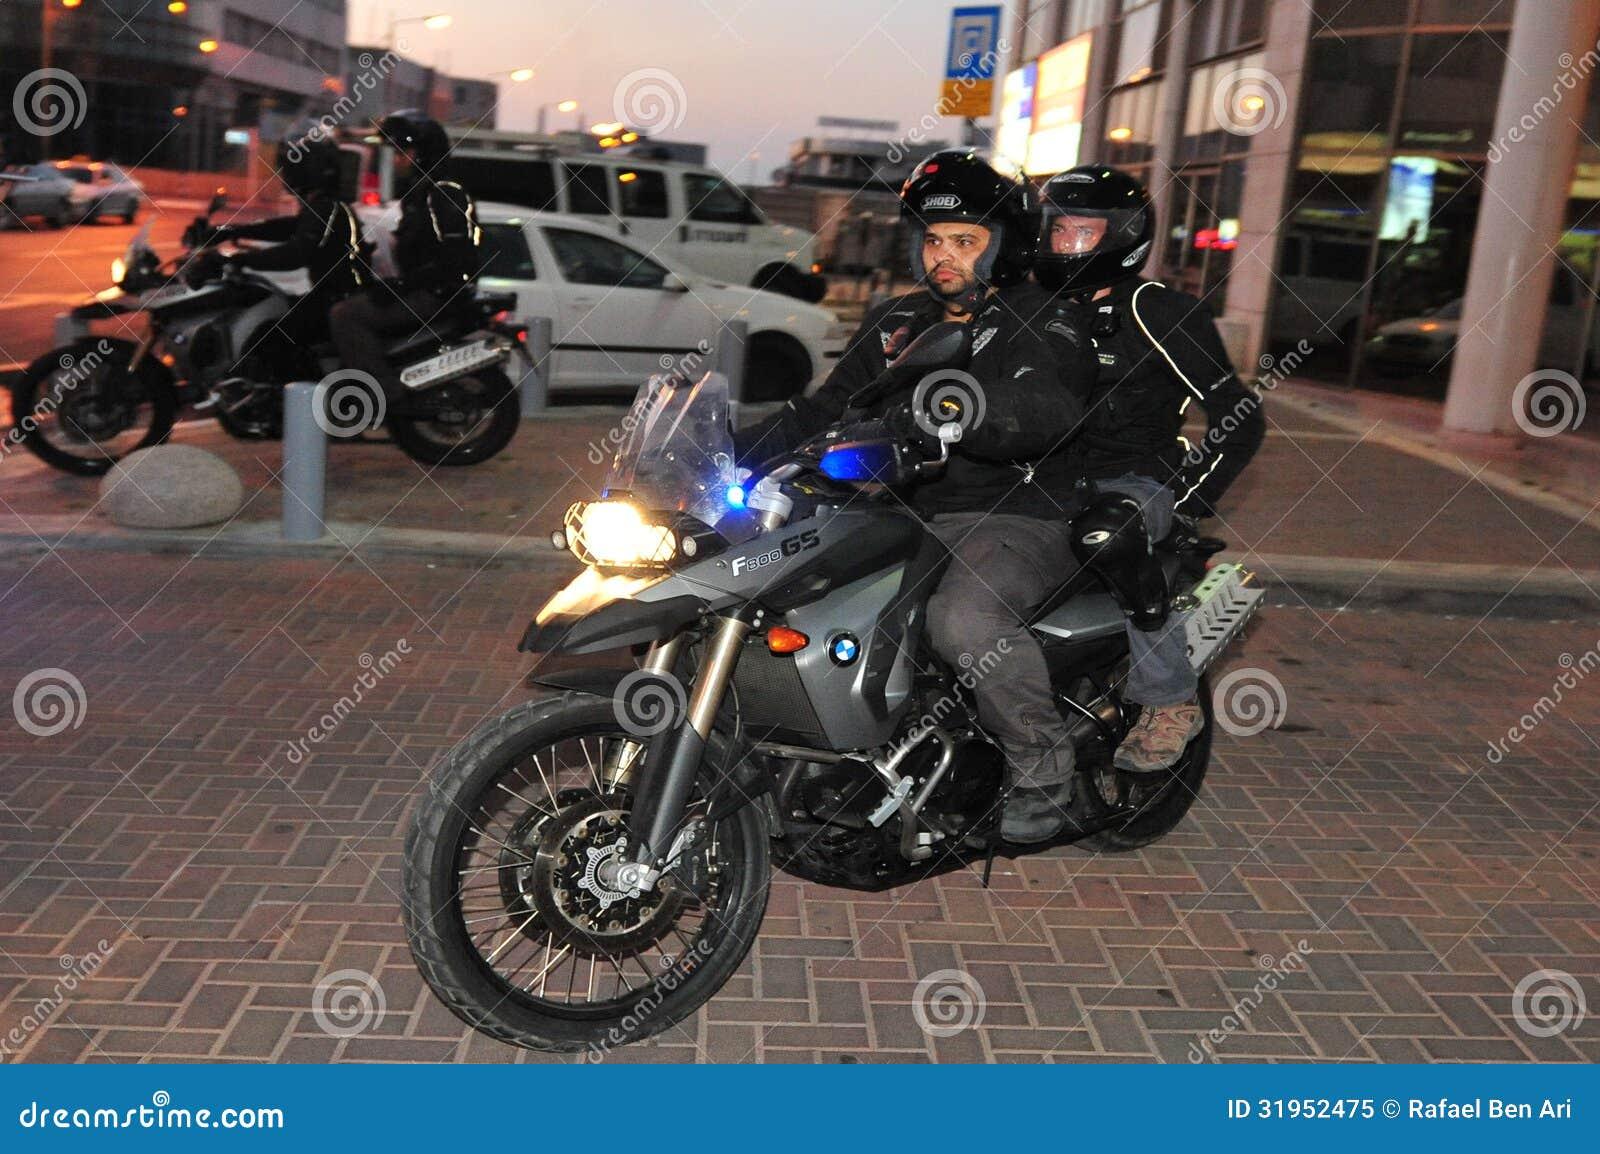 Kawasaki Police Special